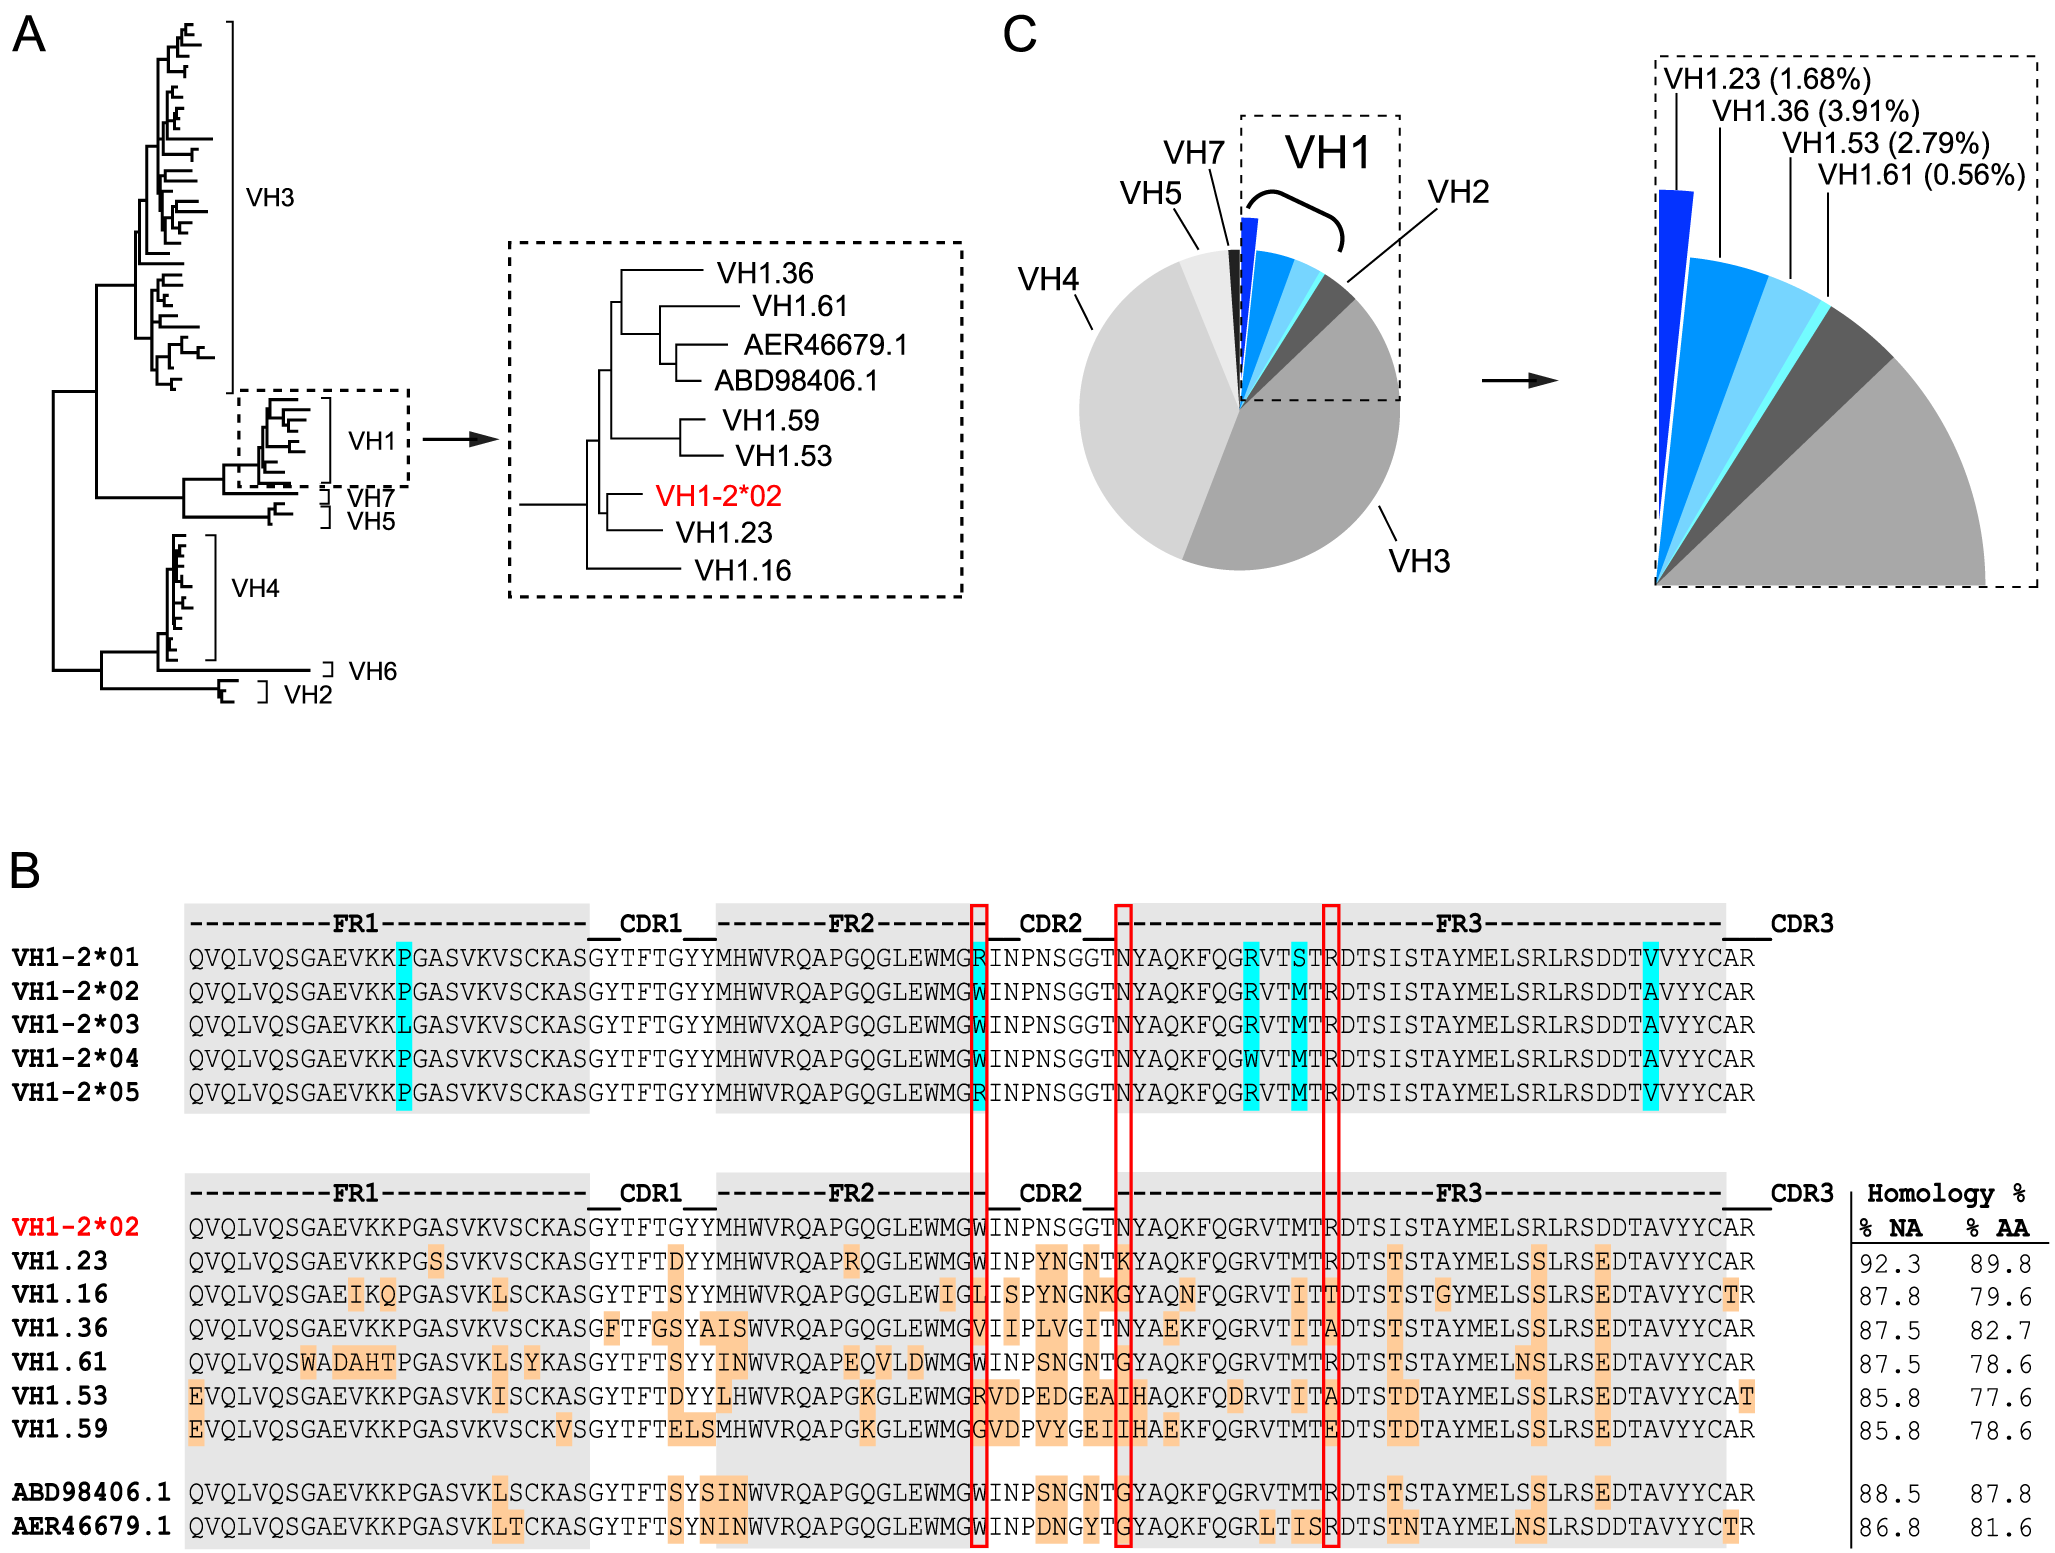 NHP VH1 gene segment usage.